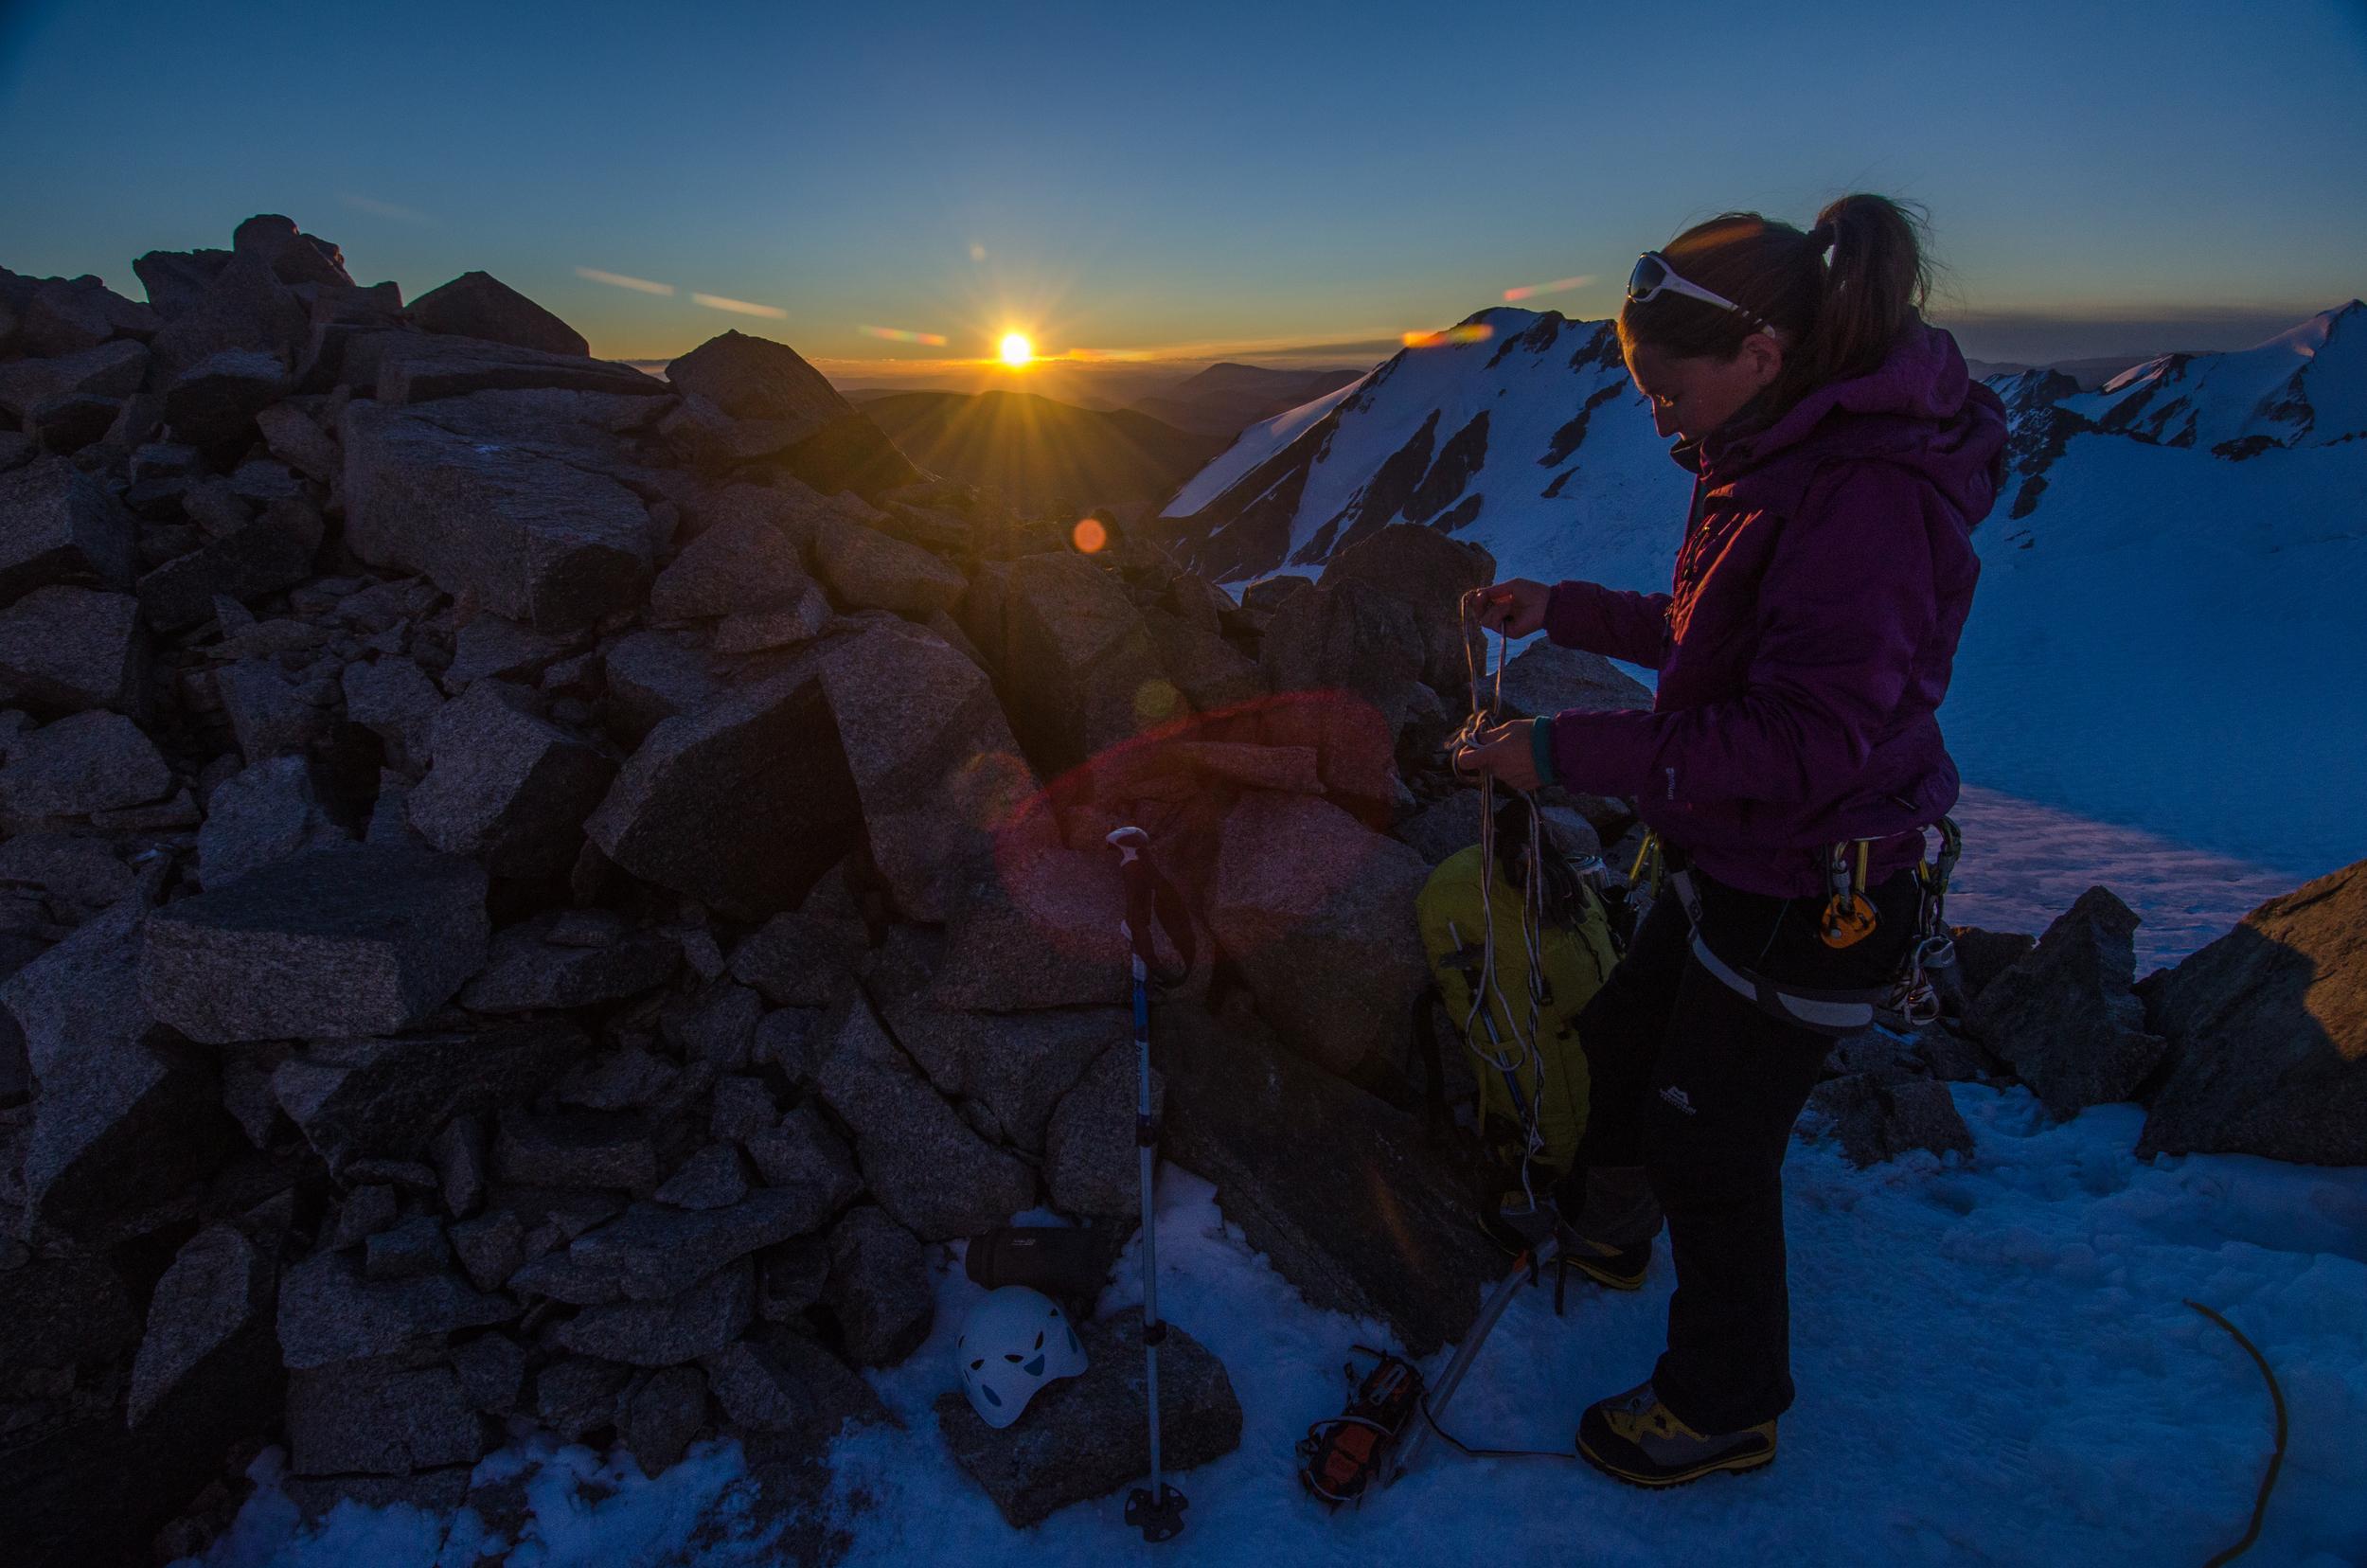 Alpine start to head for the summit